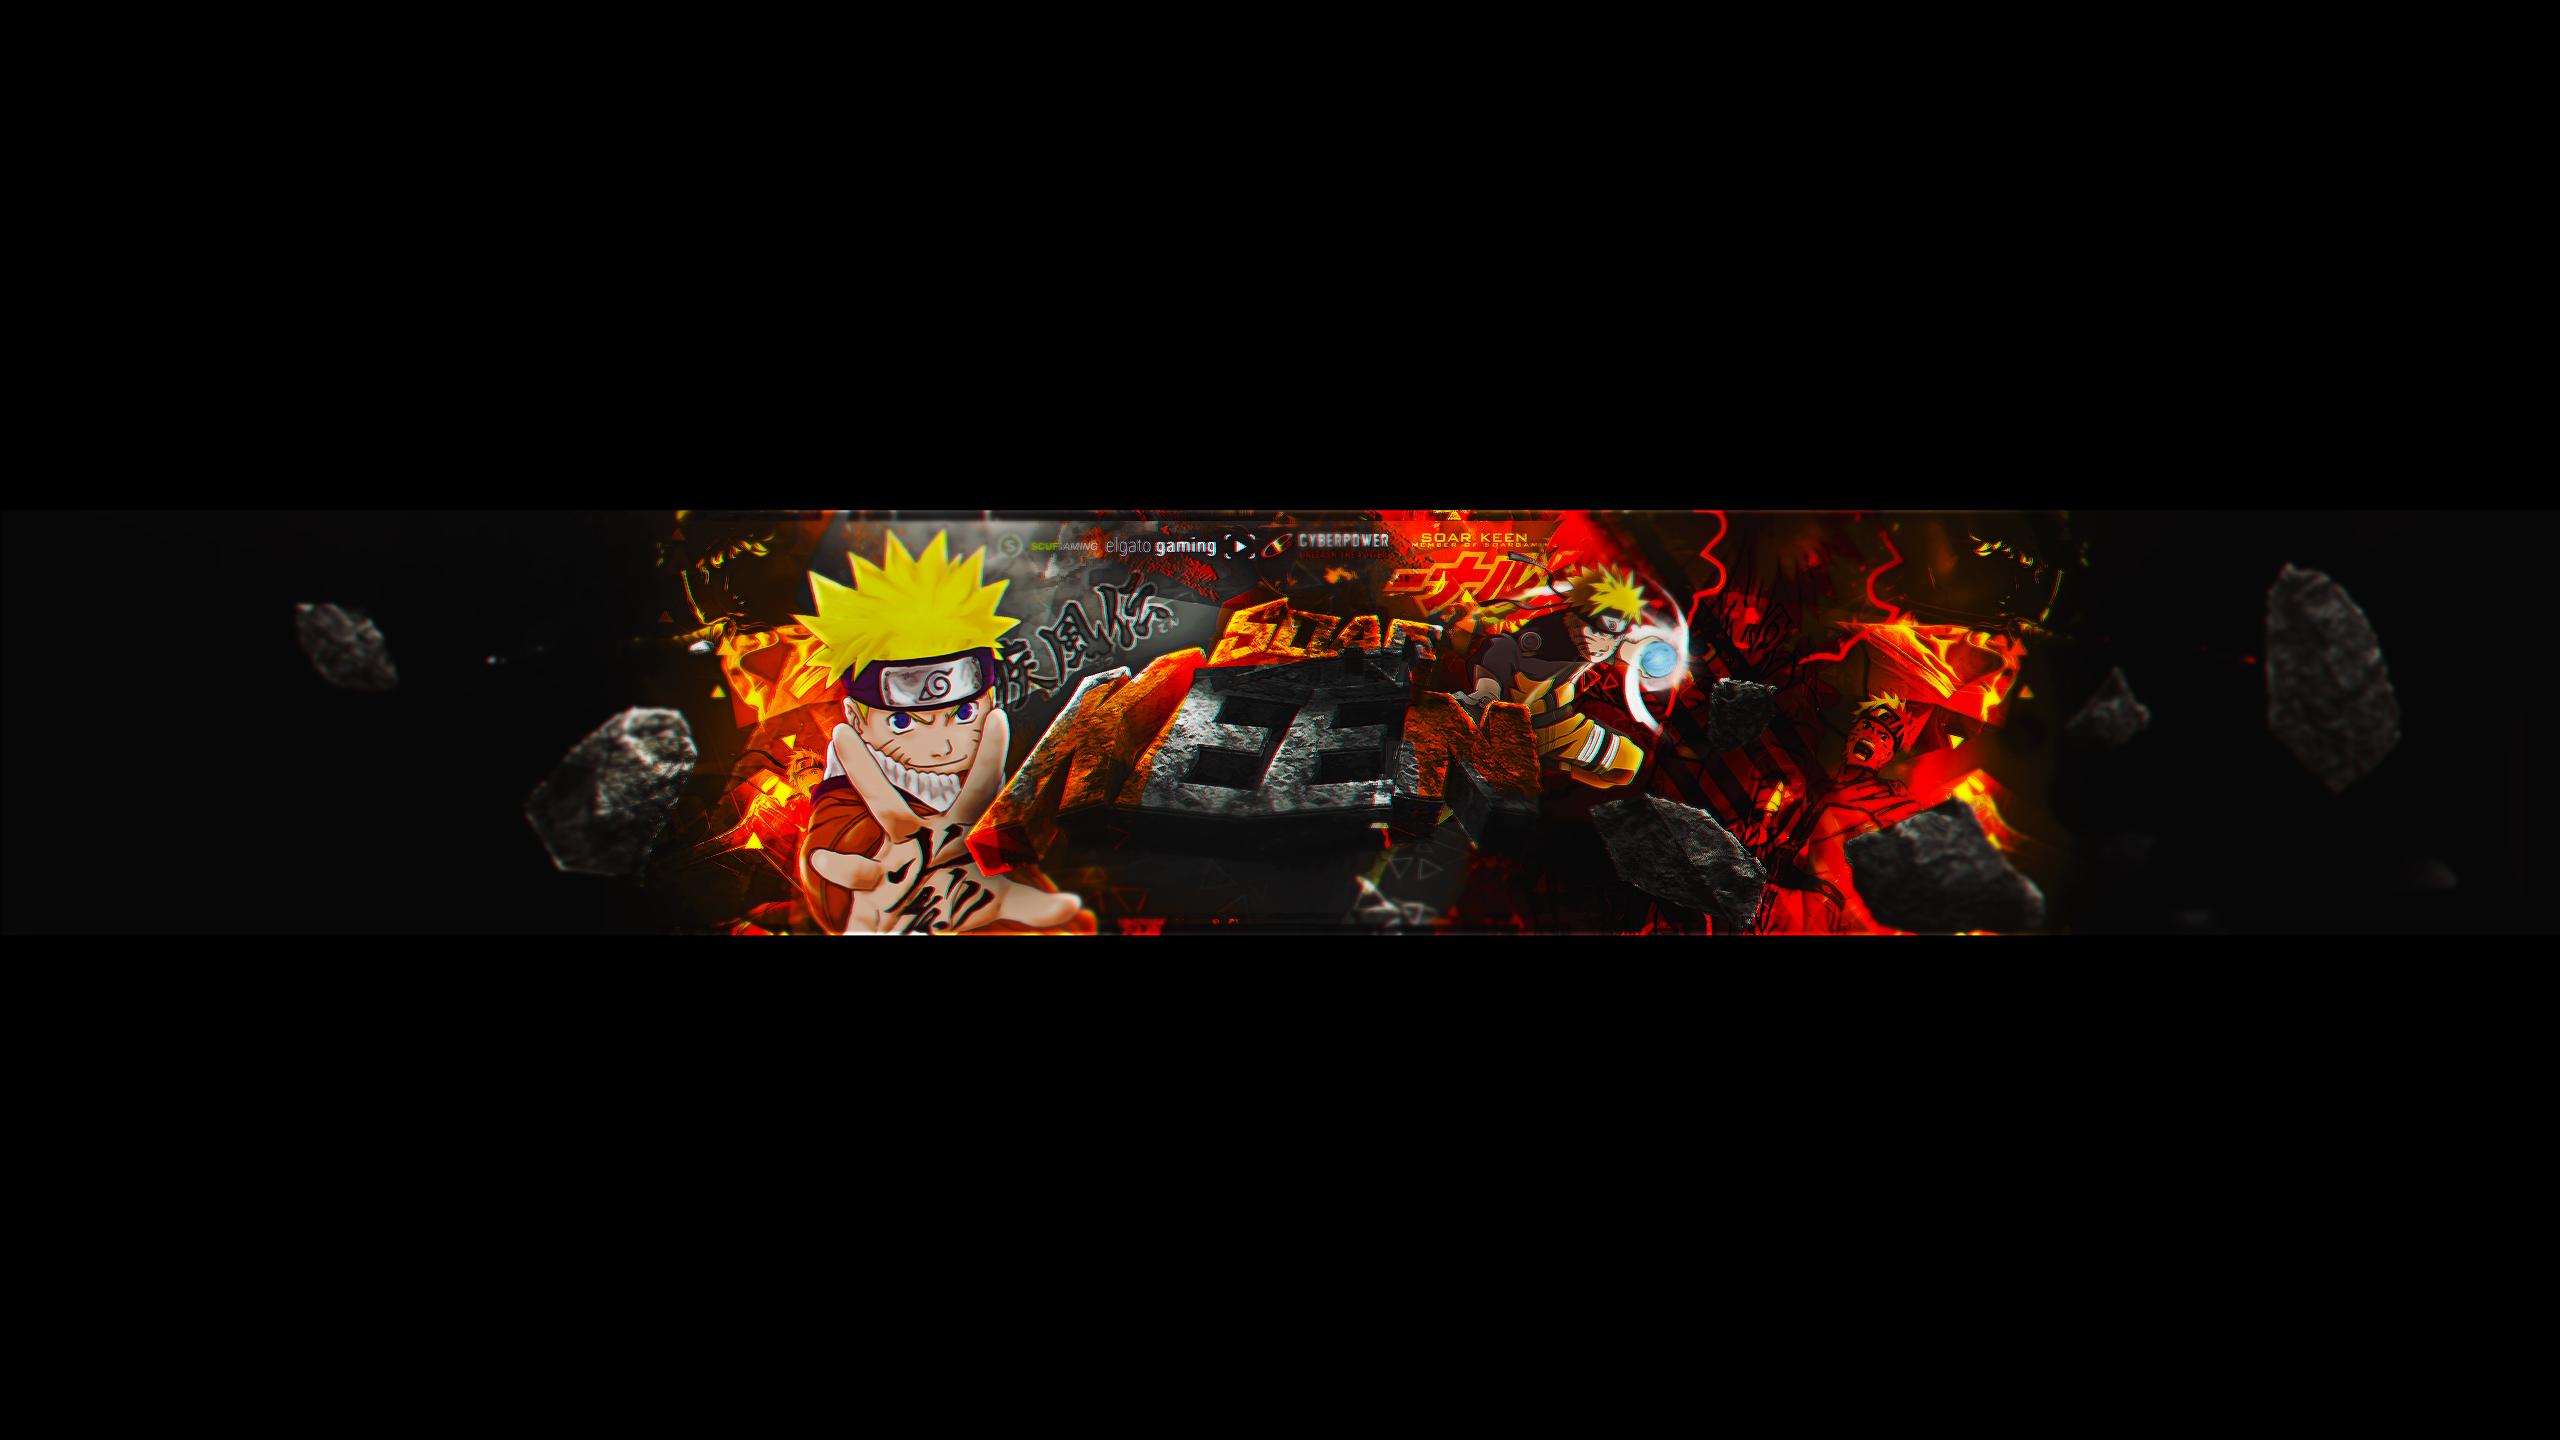 SoaR Keen Naruto Banner by ResurgeART on DeviantArt